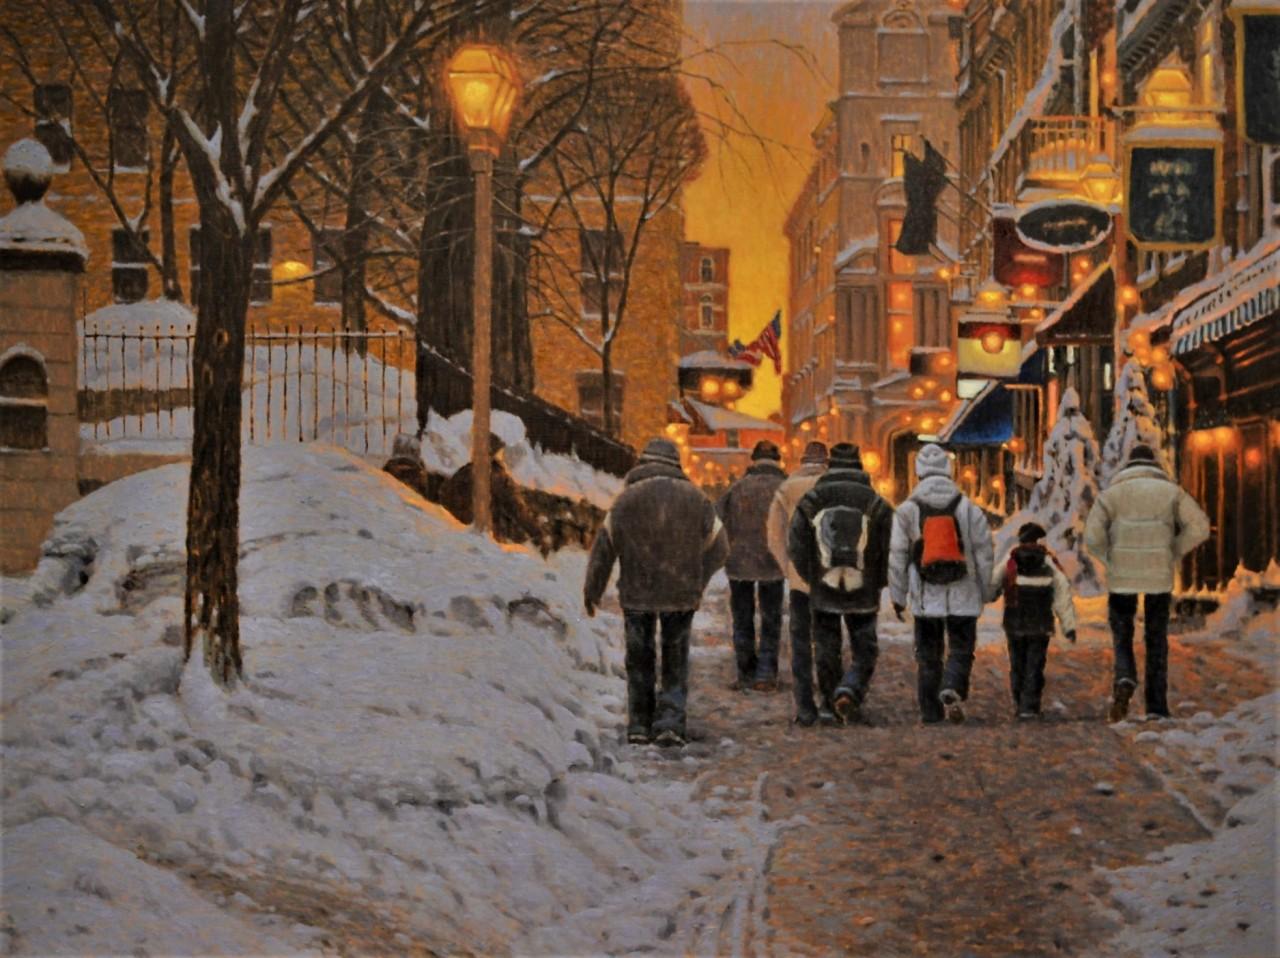 Улица Сент-Анн, Старый Квебек. Автор Ришар Савуа